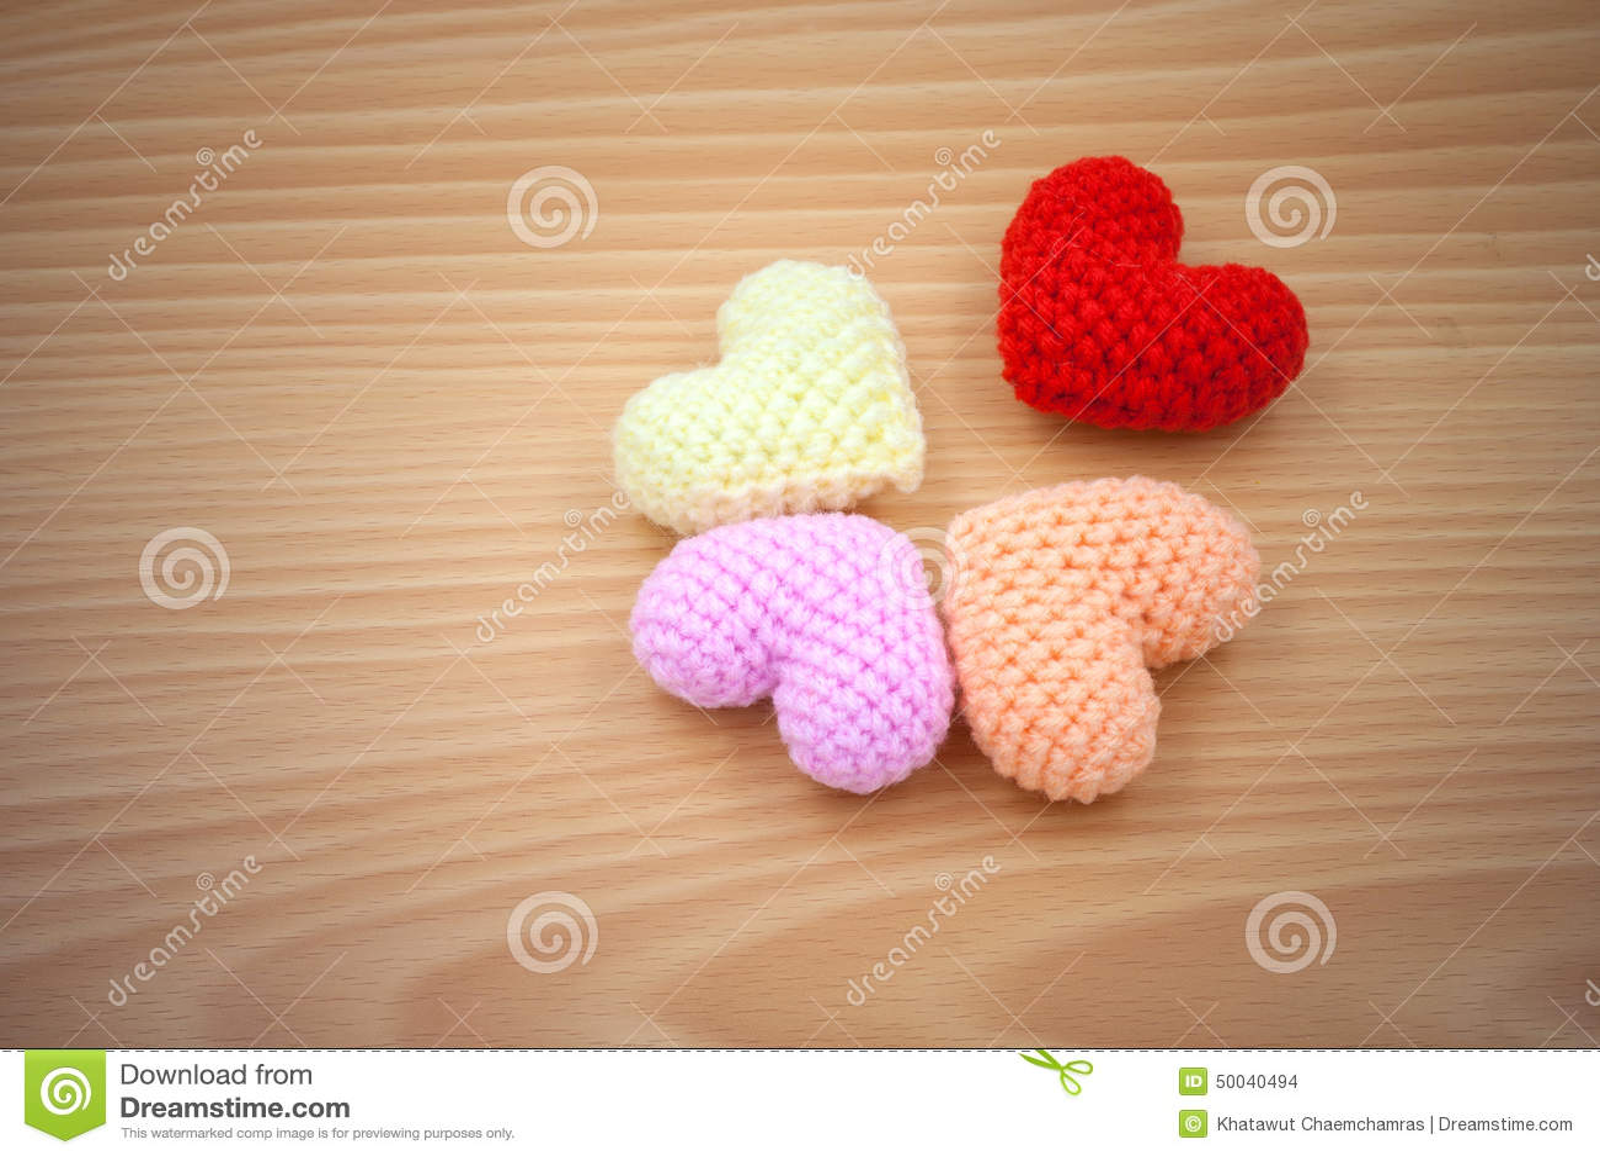 Yarn hearts on wood background